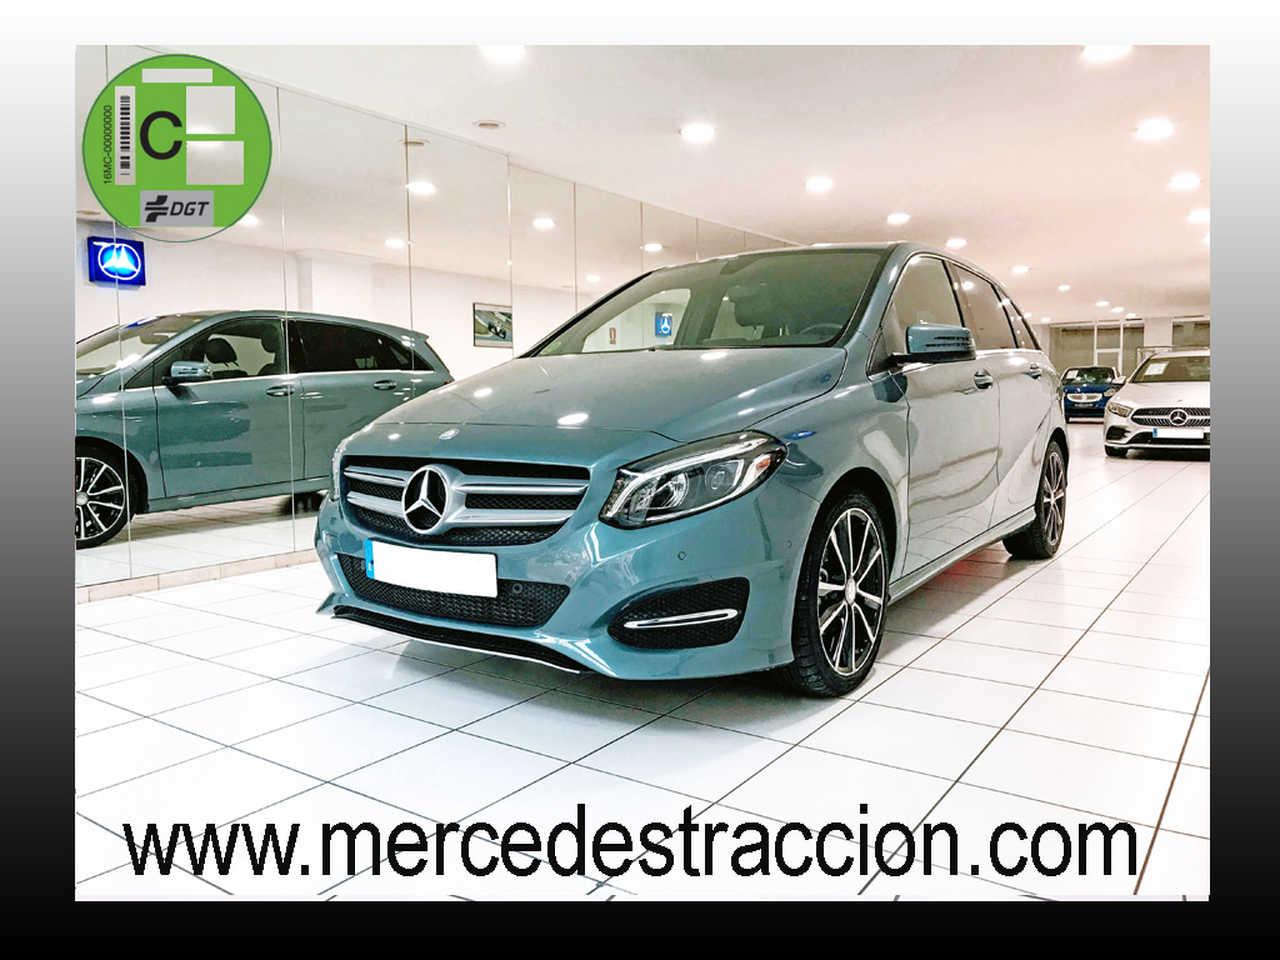 Mercedes Clase B 180 d/ 7G-DCT/Paquete Sport/Urban/Clima/35.000 km   - Foto 1